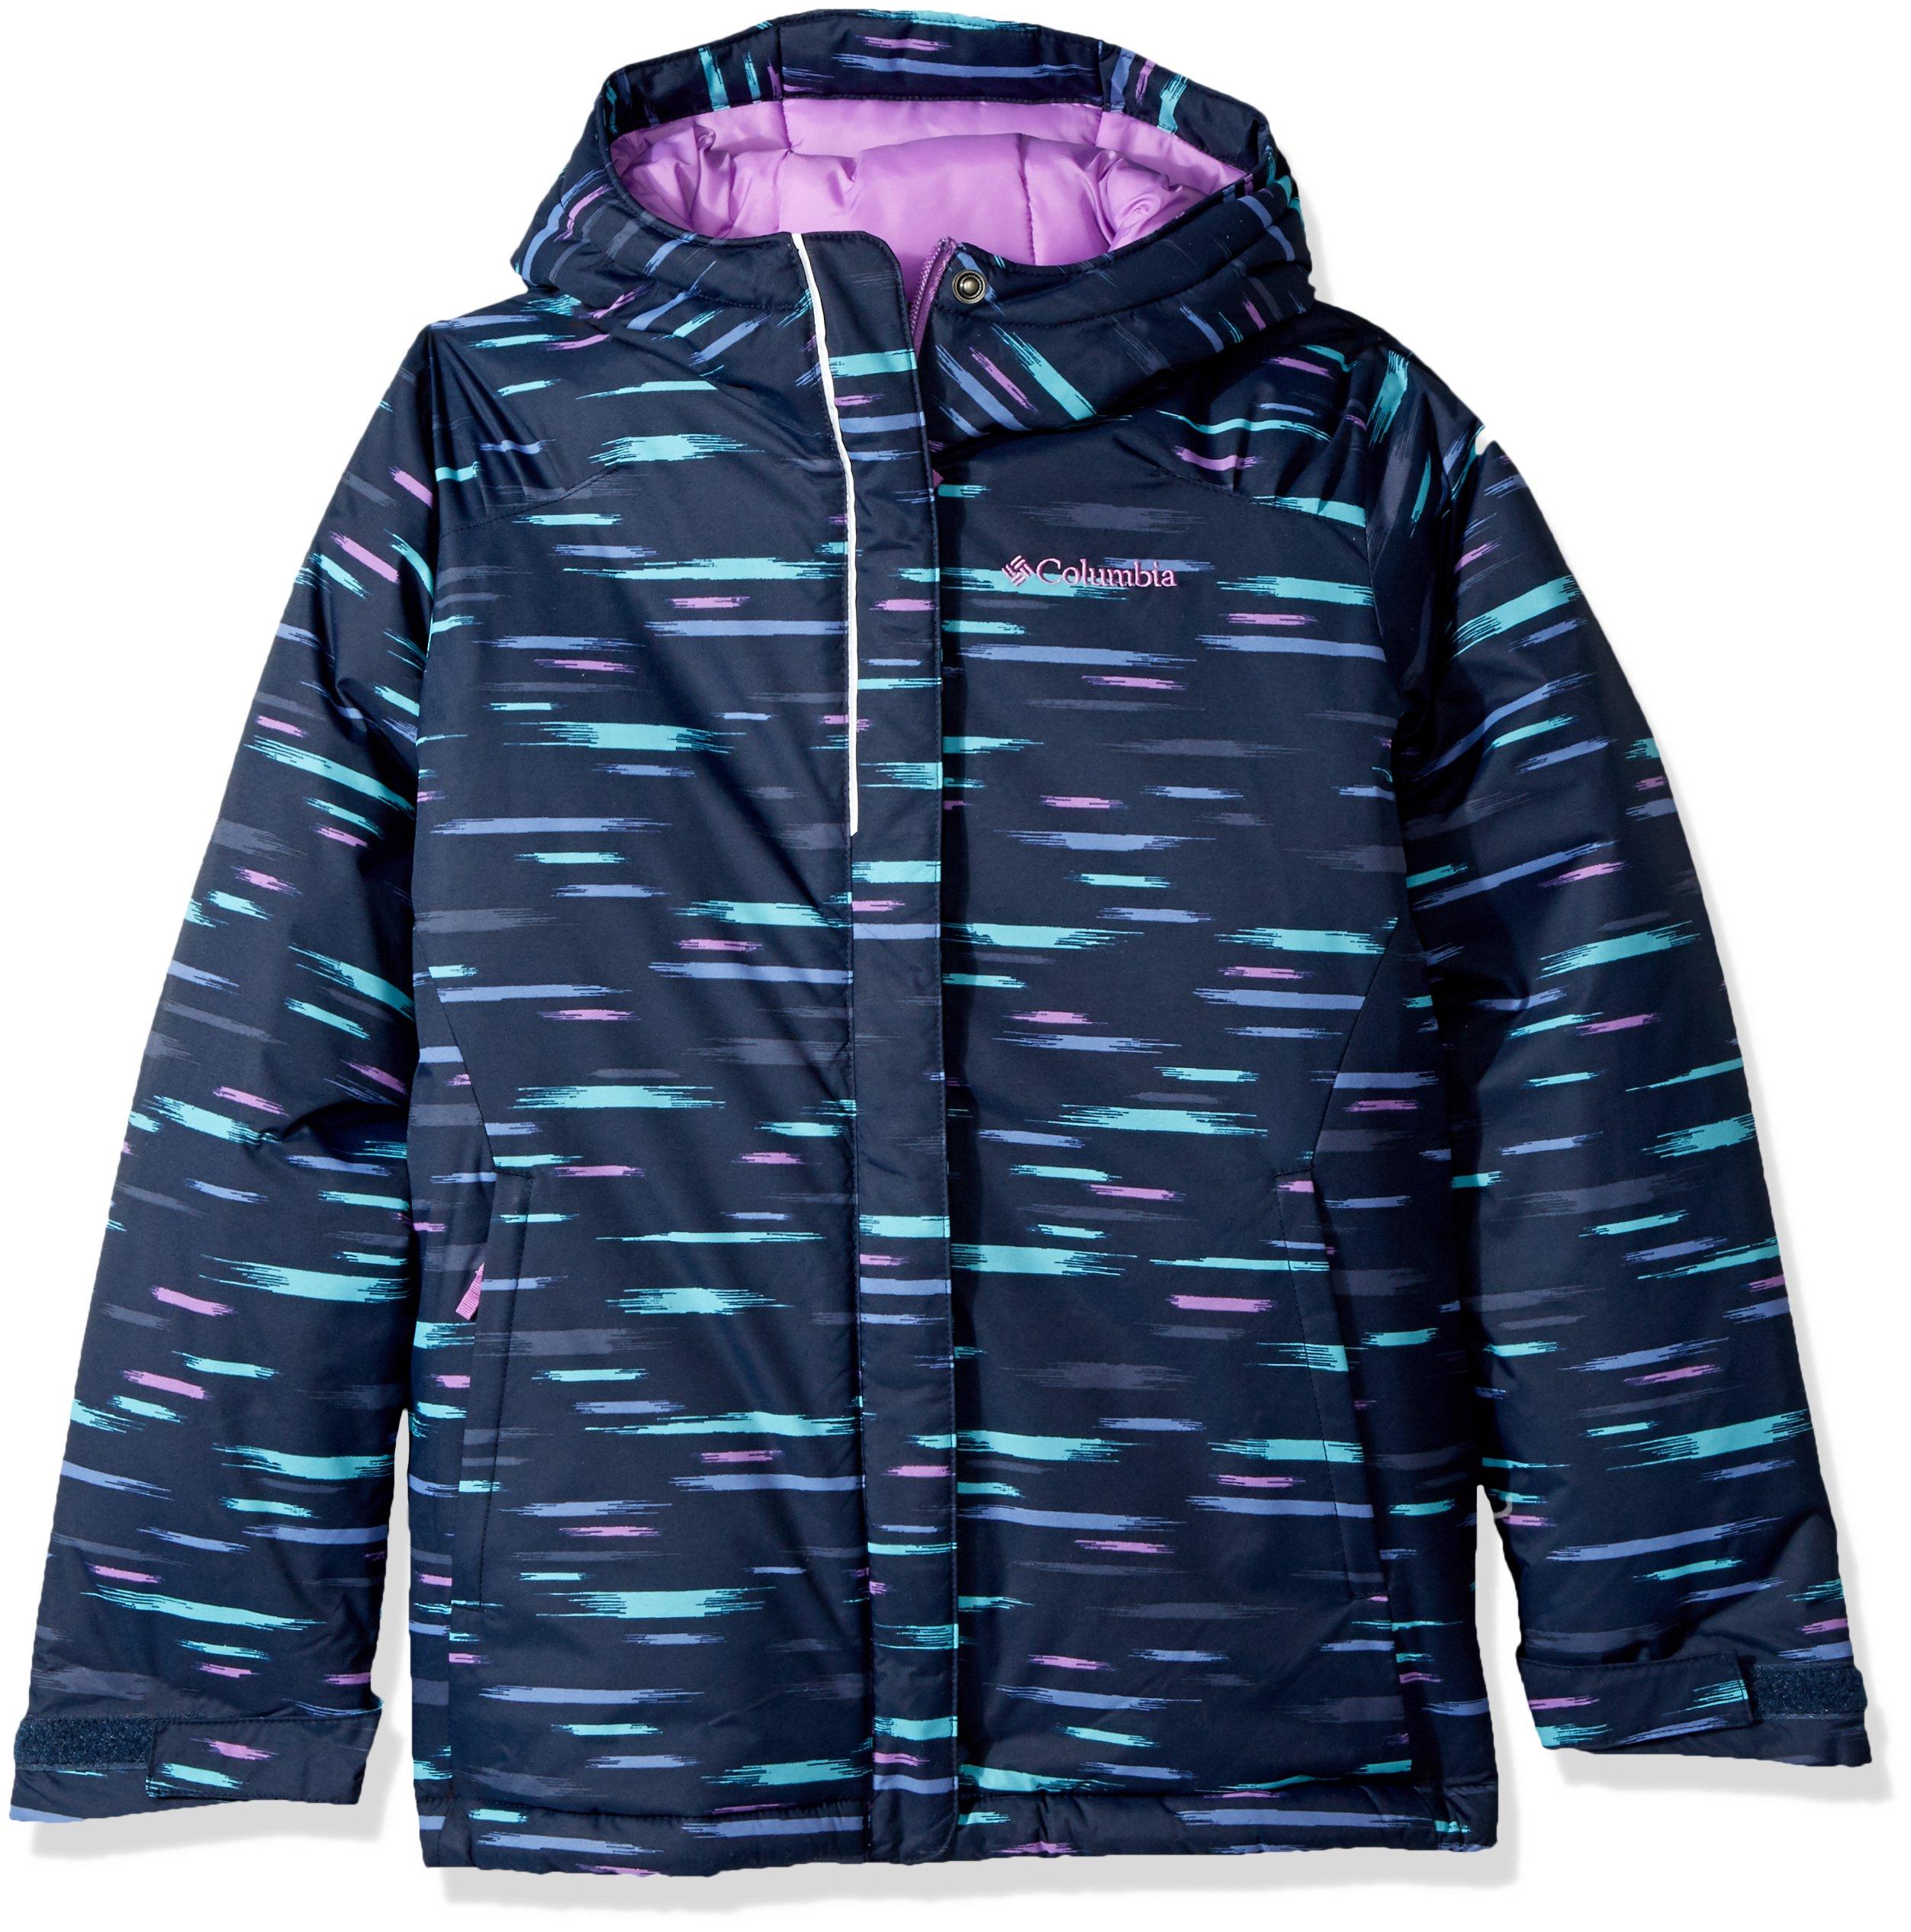 Columbia Big Girls' Horizon Ride Jacket, Collegiate Navy Lite Brite, X-Large